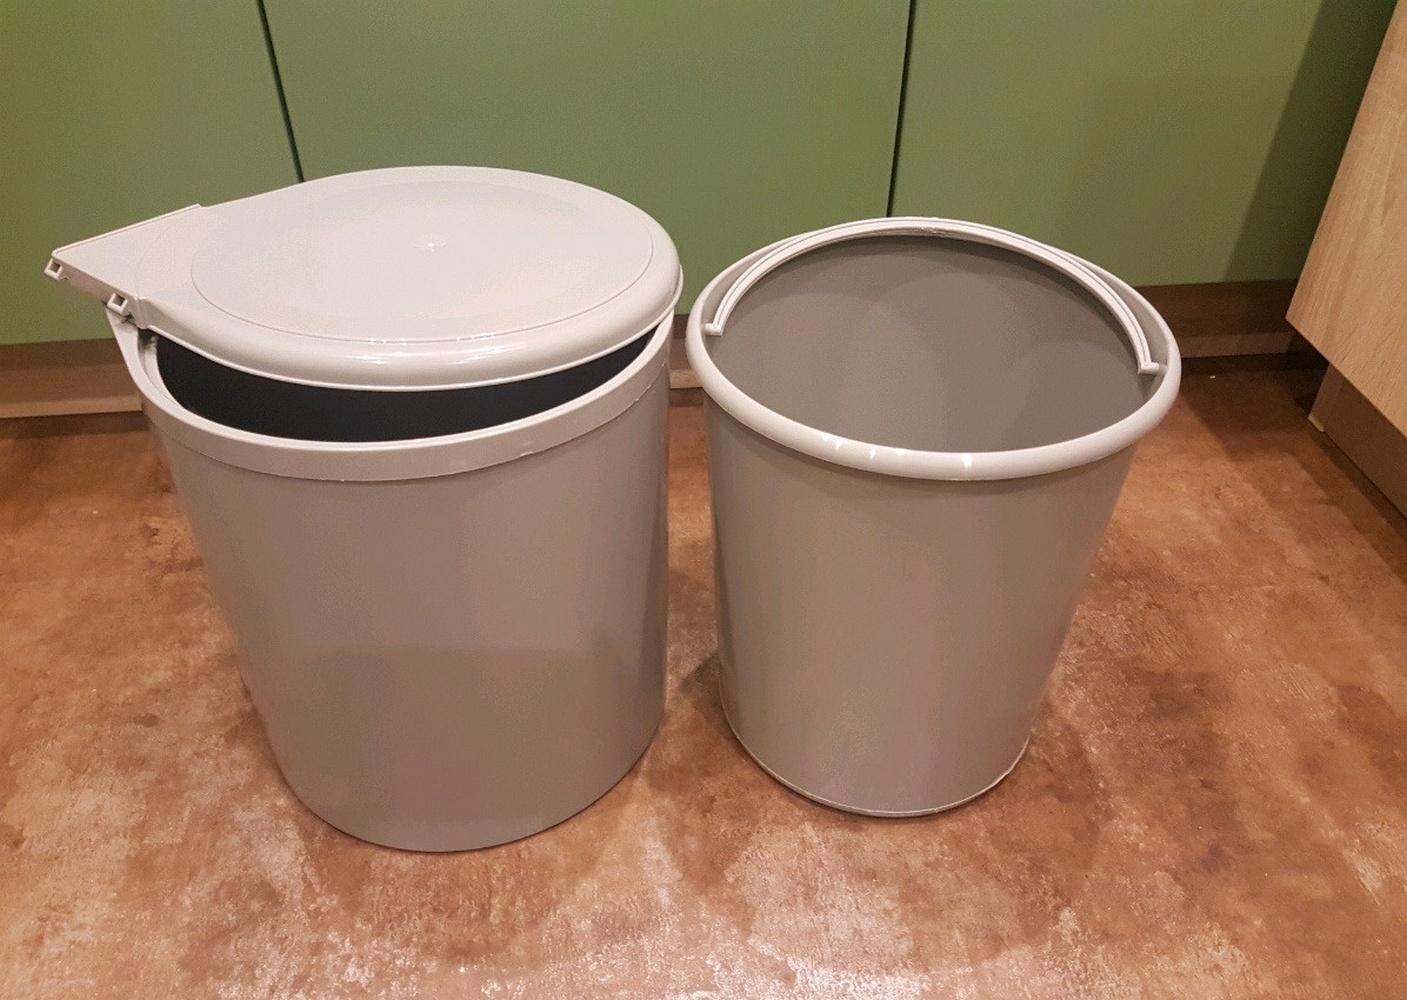 кухонные ведра для мусора